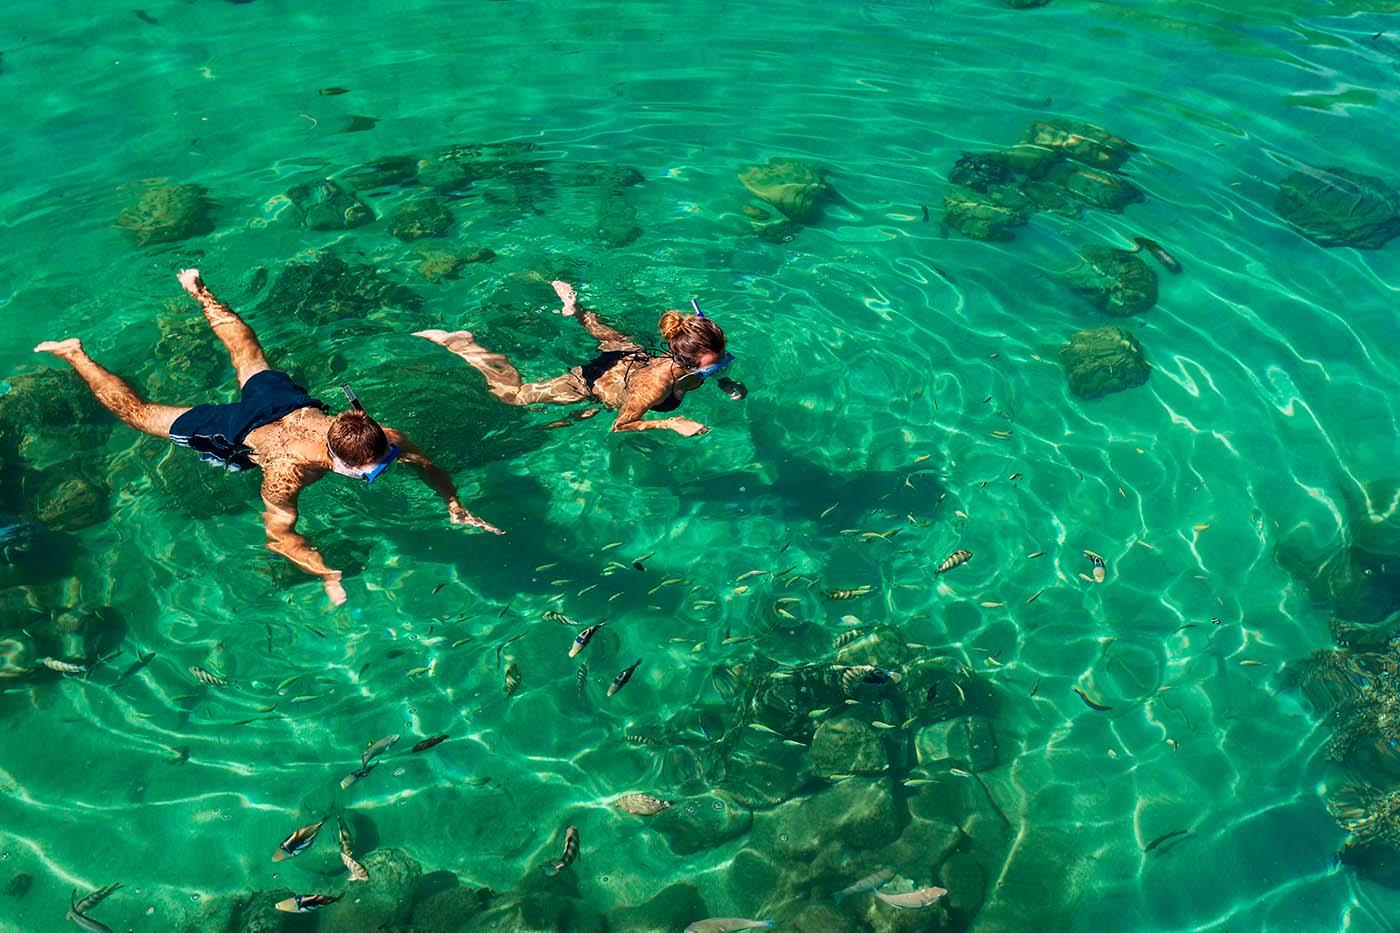 Snorkelling in the Musandam